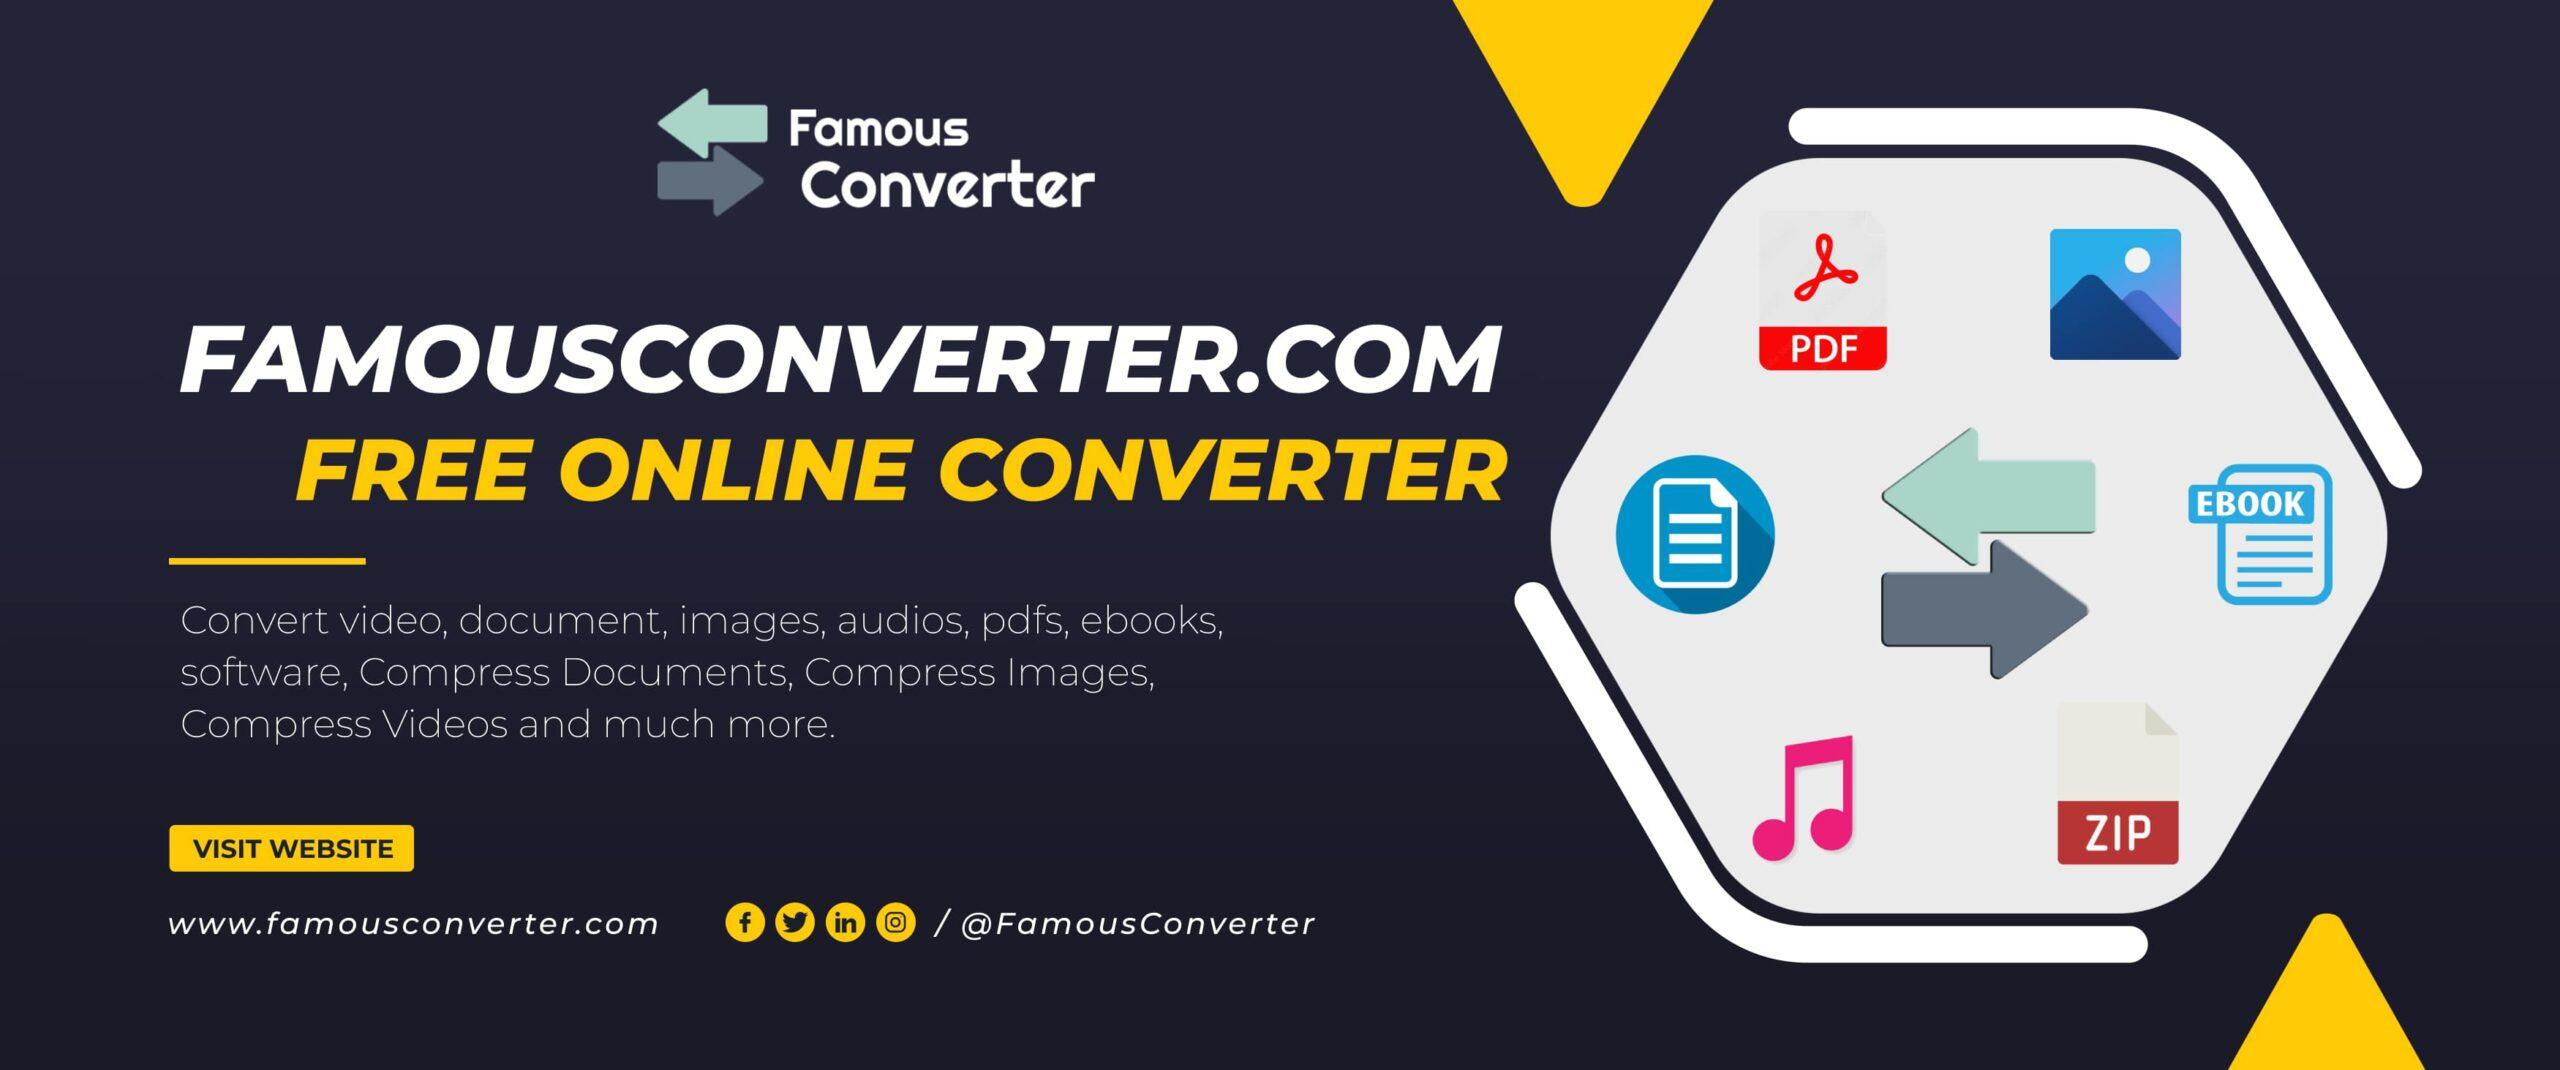 Free Online Image Converter - Online Image Resizer